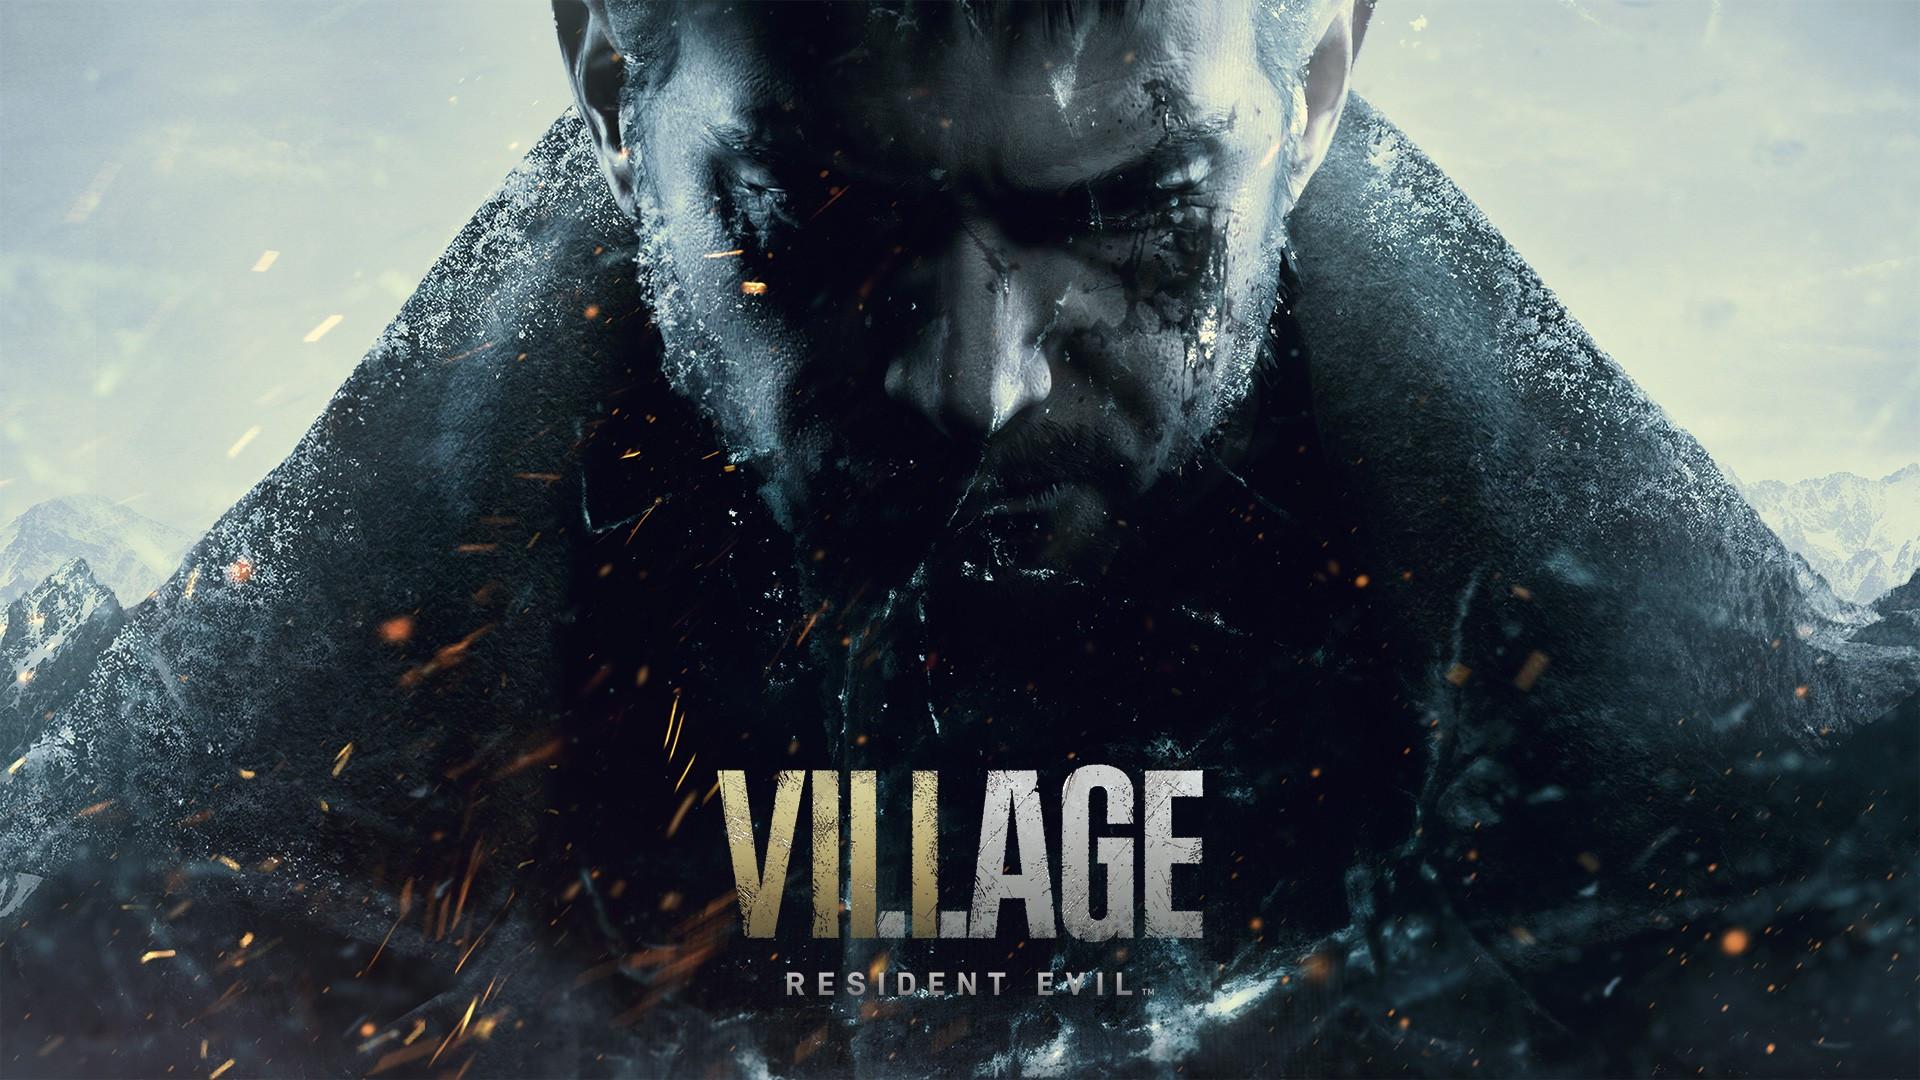 RESIDENT EVIL 8 VILLAGE All Cutscenes (Game Movie) 4K 60FPS Ultra HD Image